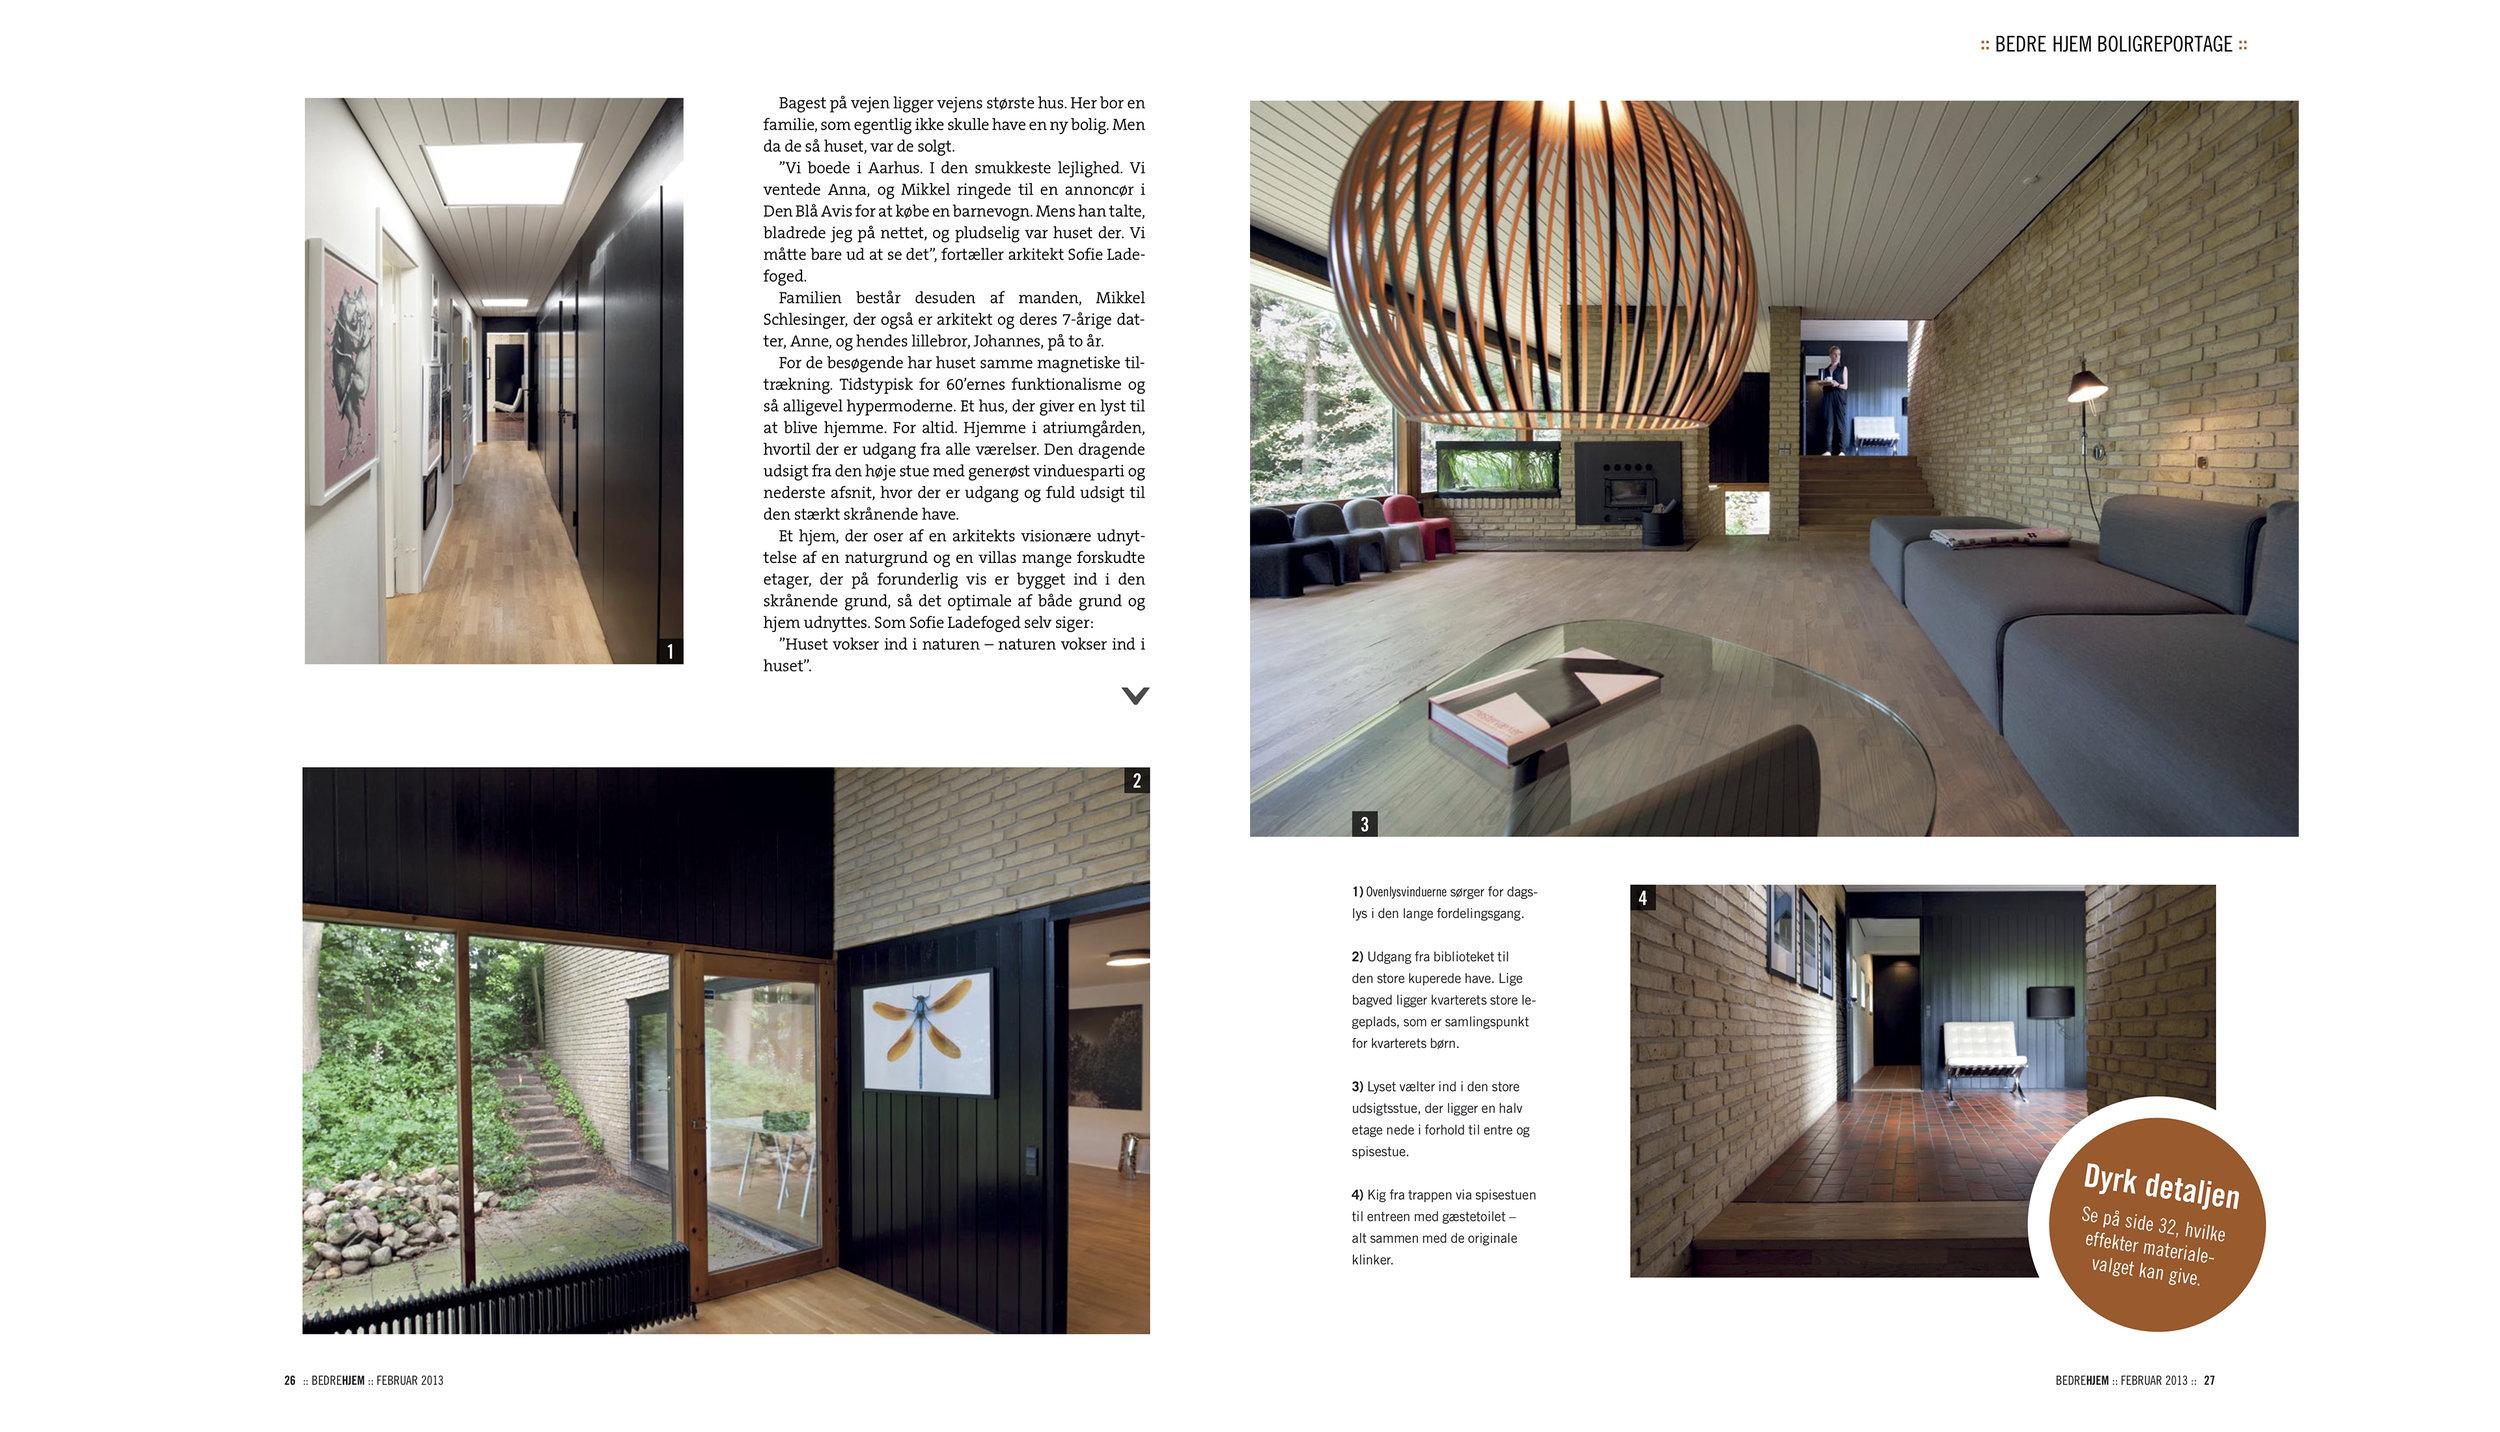 sofie-ladefoged-press-bolius-2013-page-03.jpg